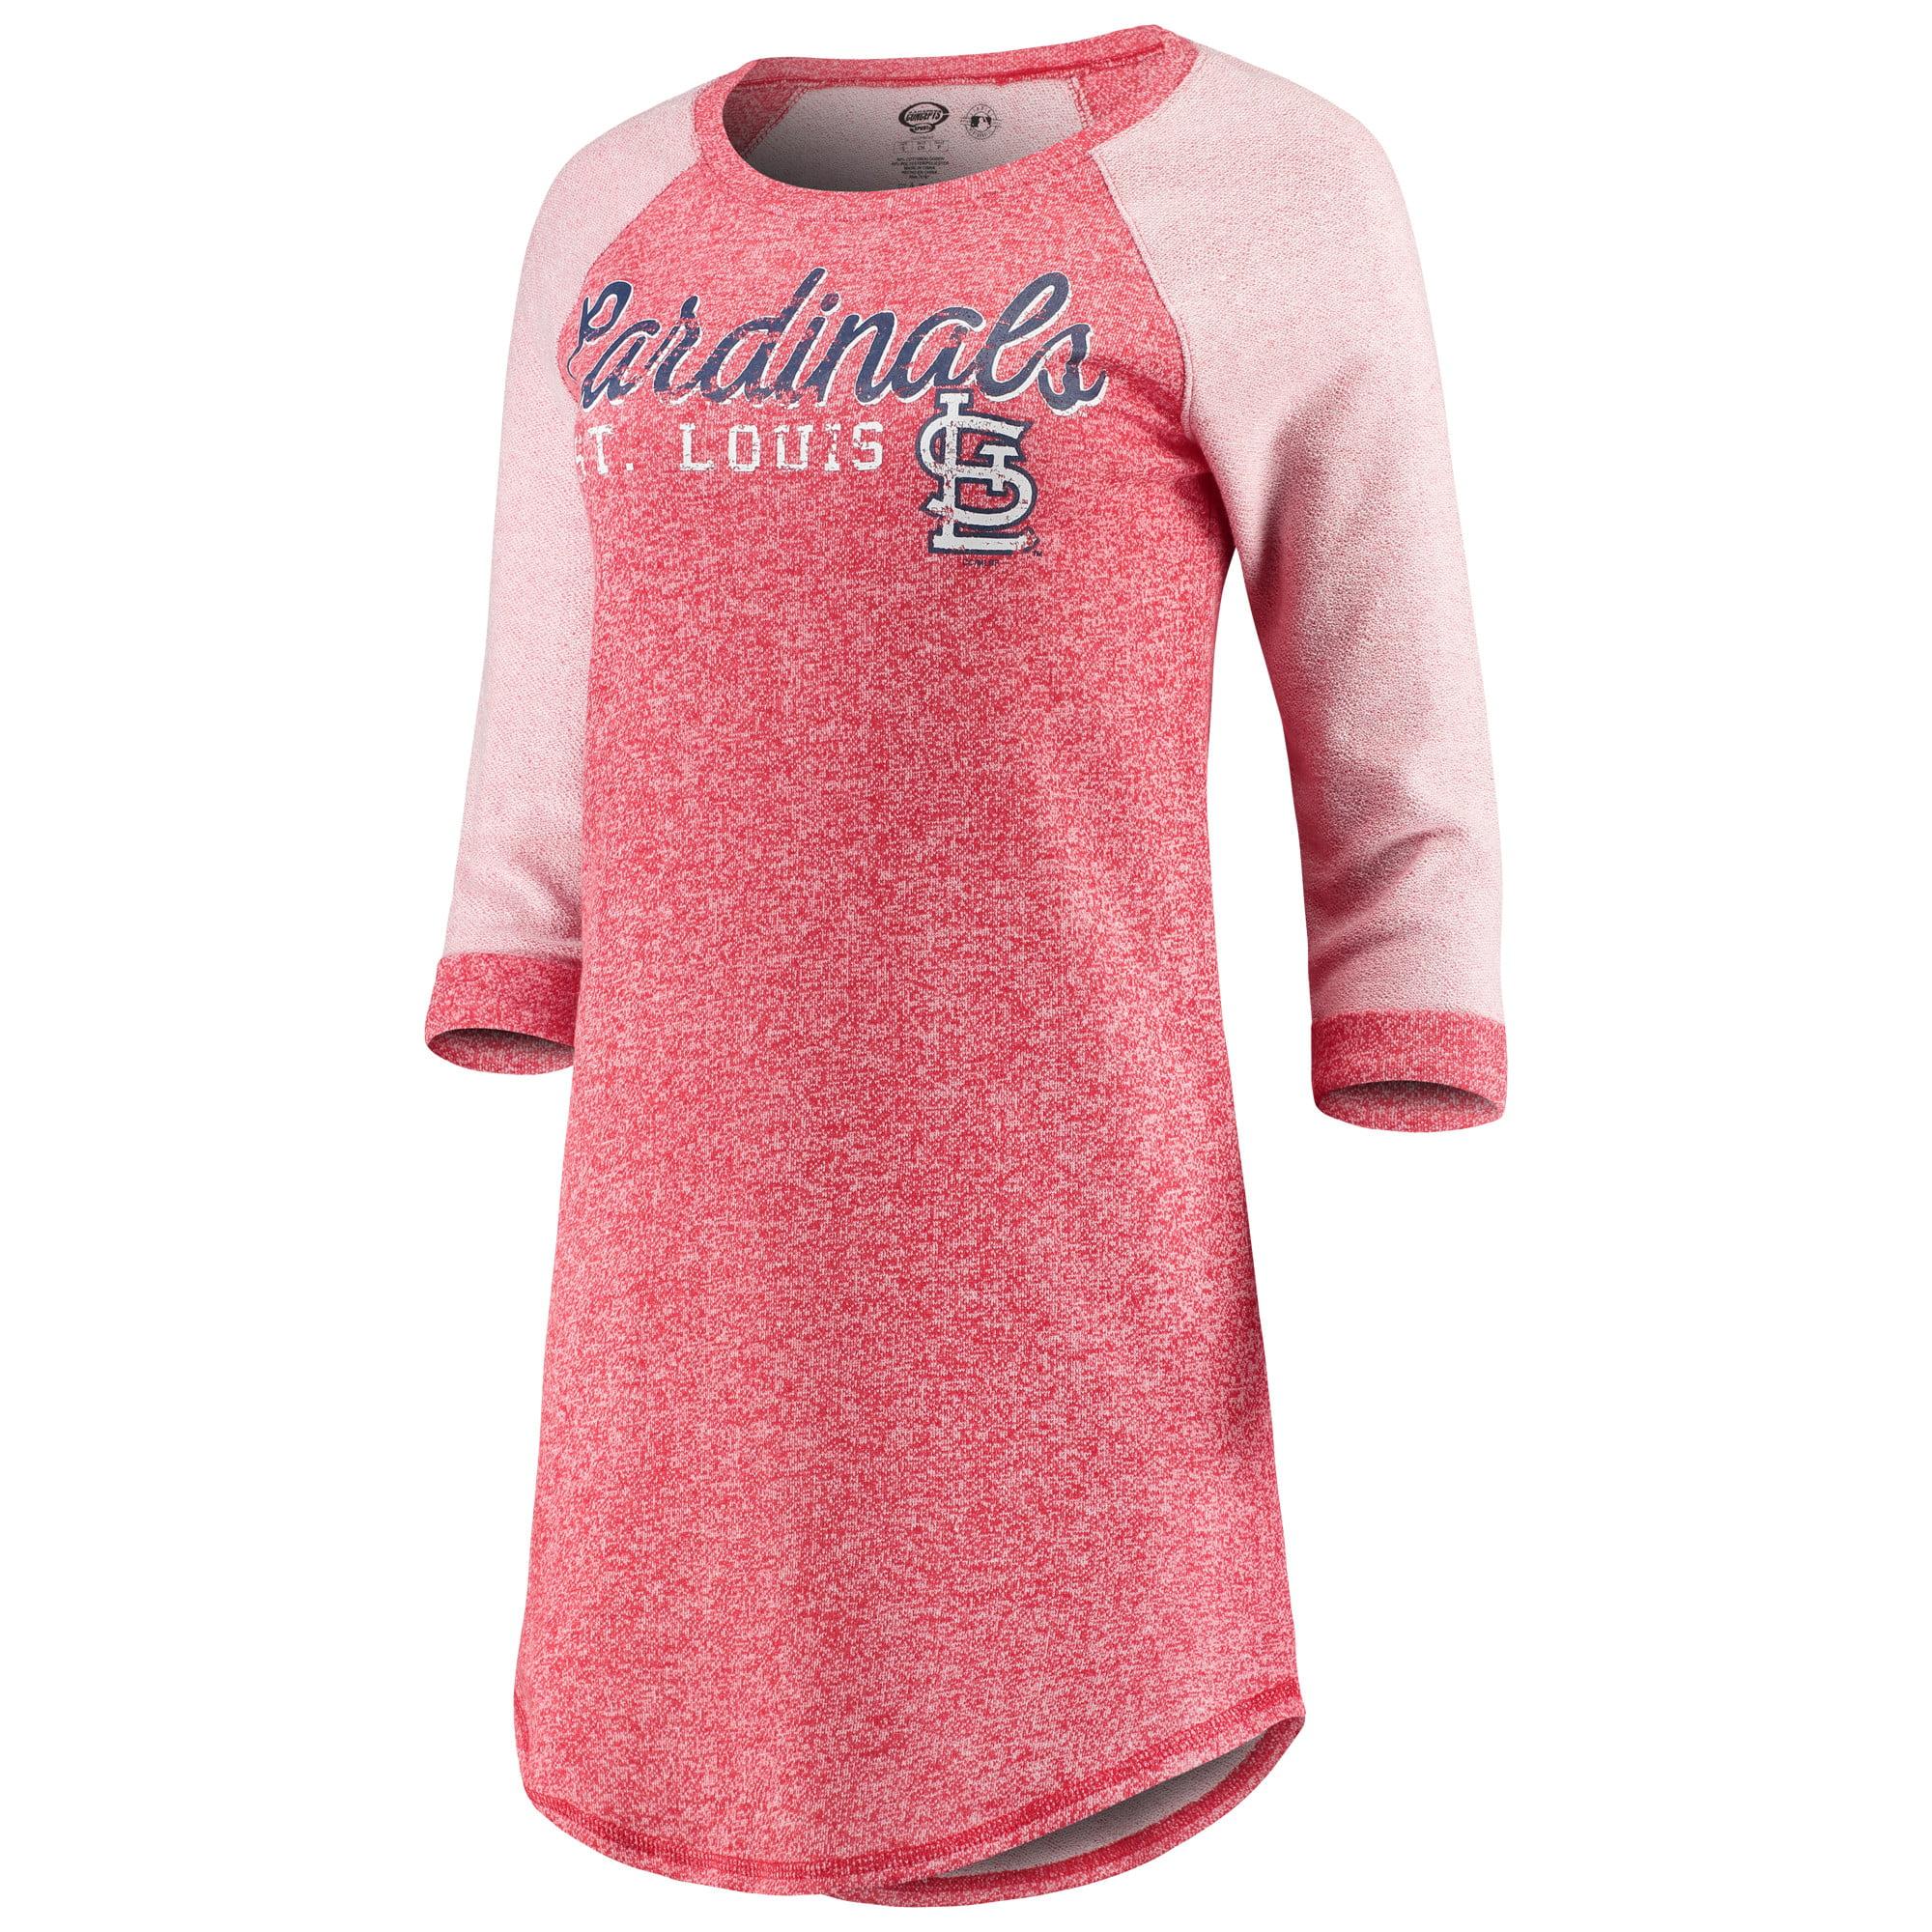 St. Louis Cardinals Concepts Sport Women's Walk-Off 3/4-Sleeve Nightshirt - Red